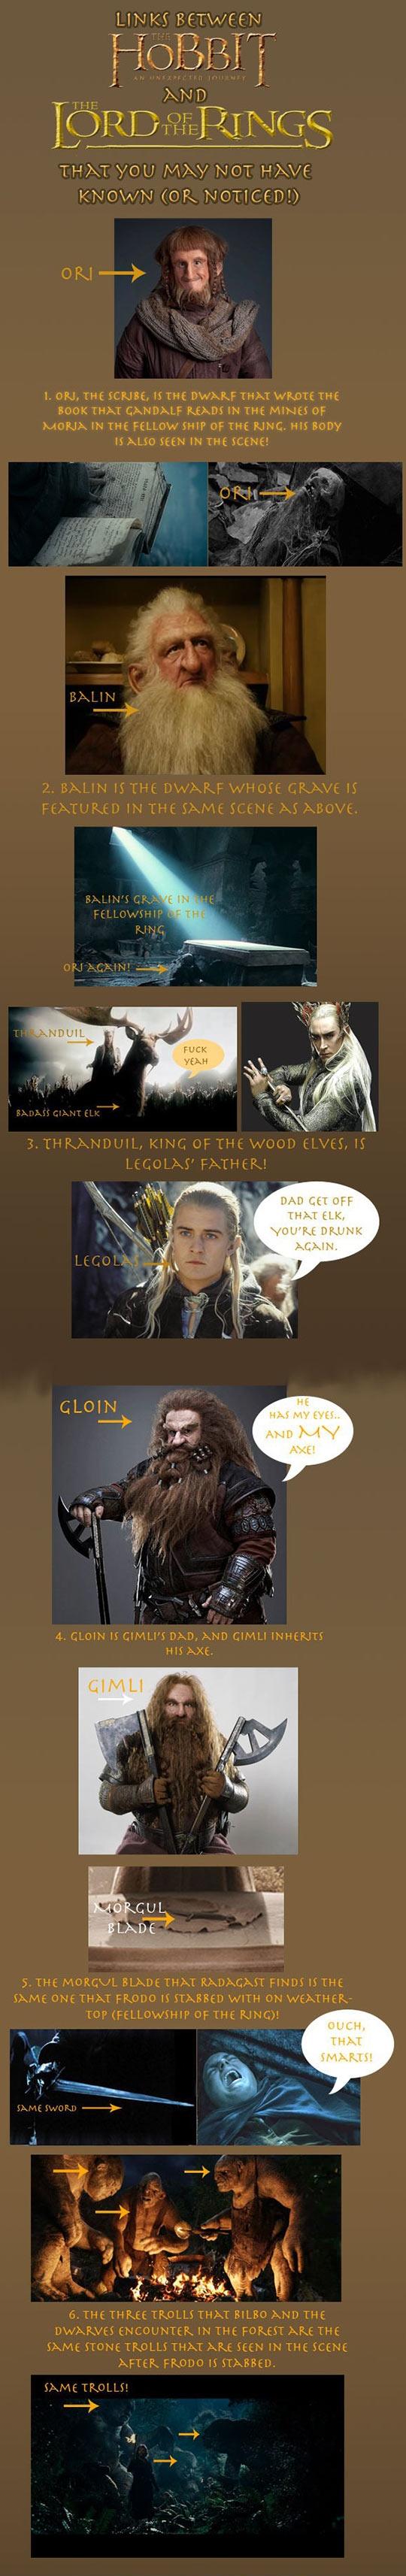 Links between The Hobbit and LOTR